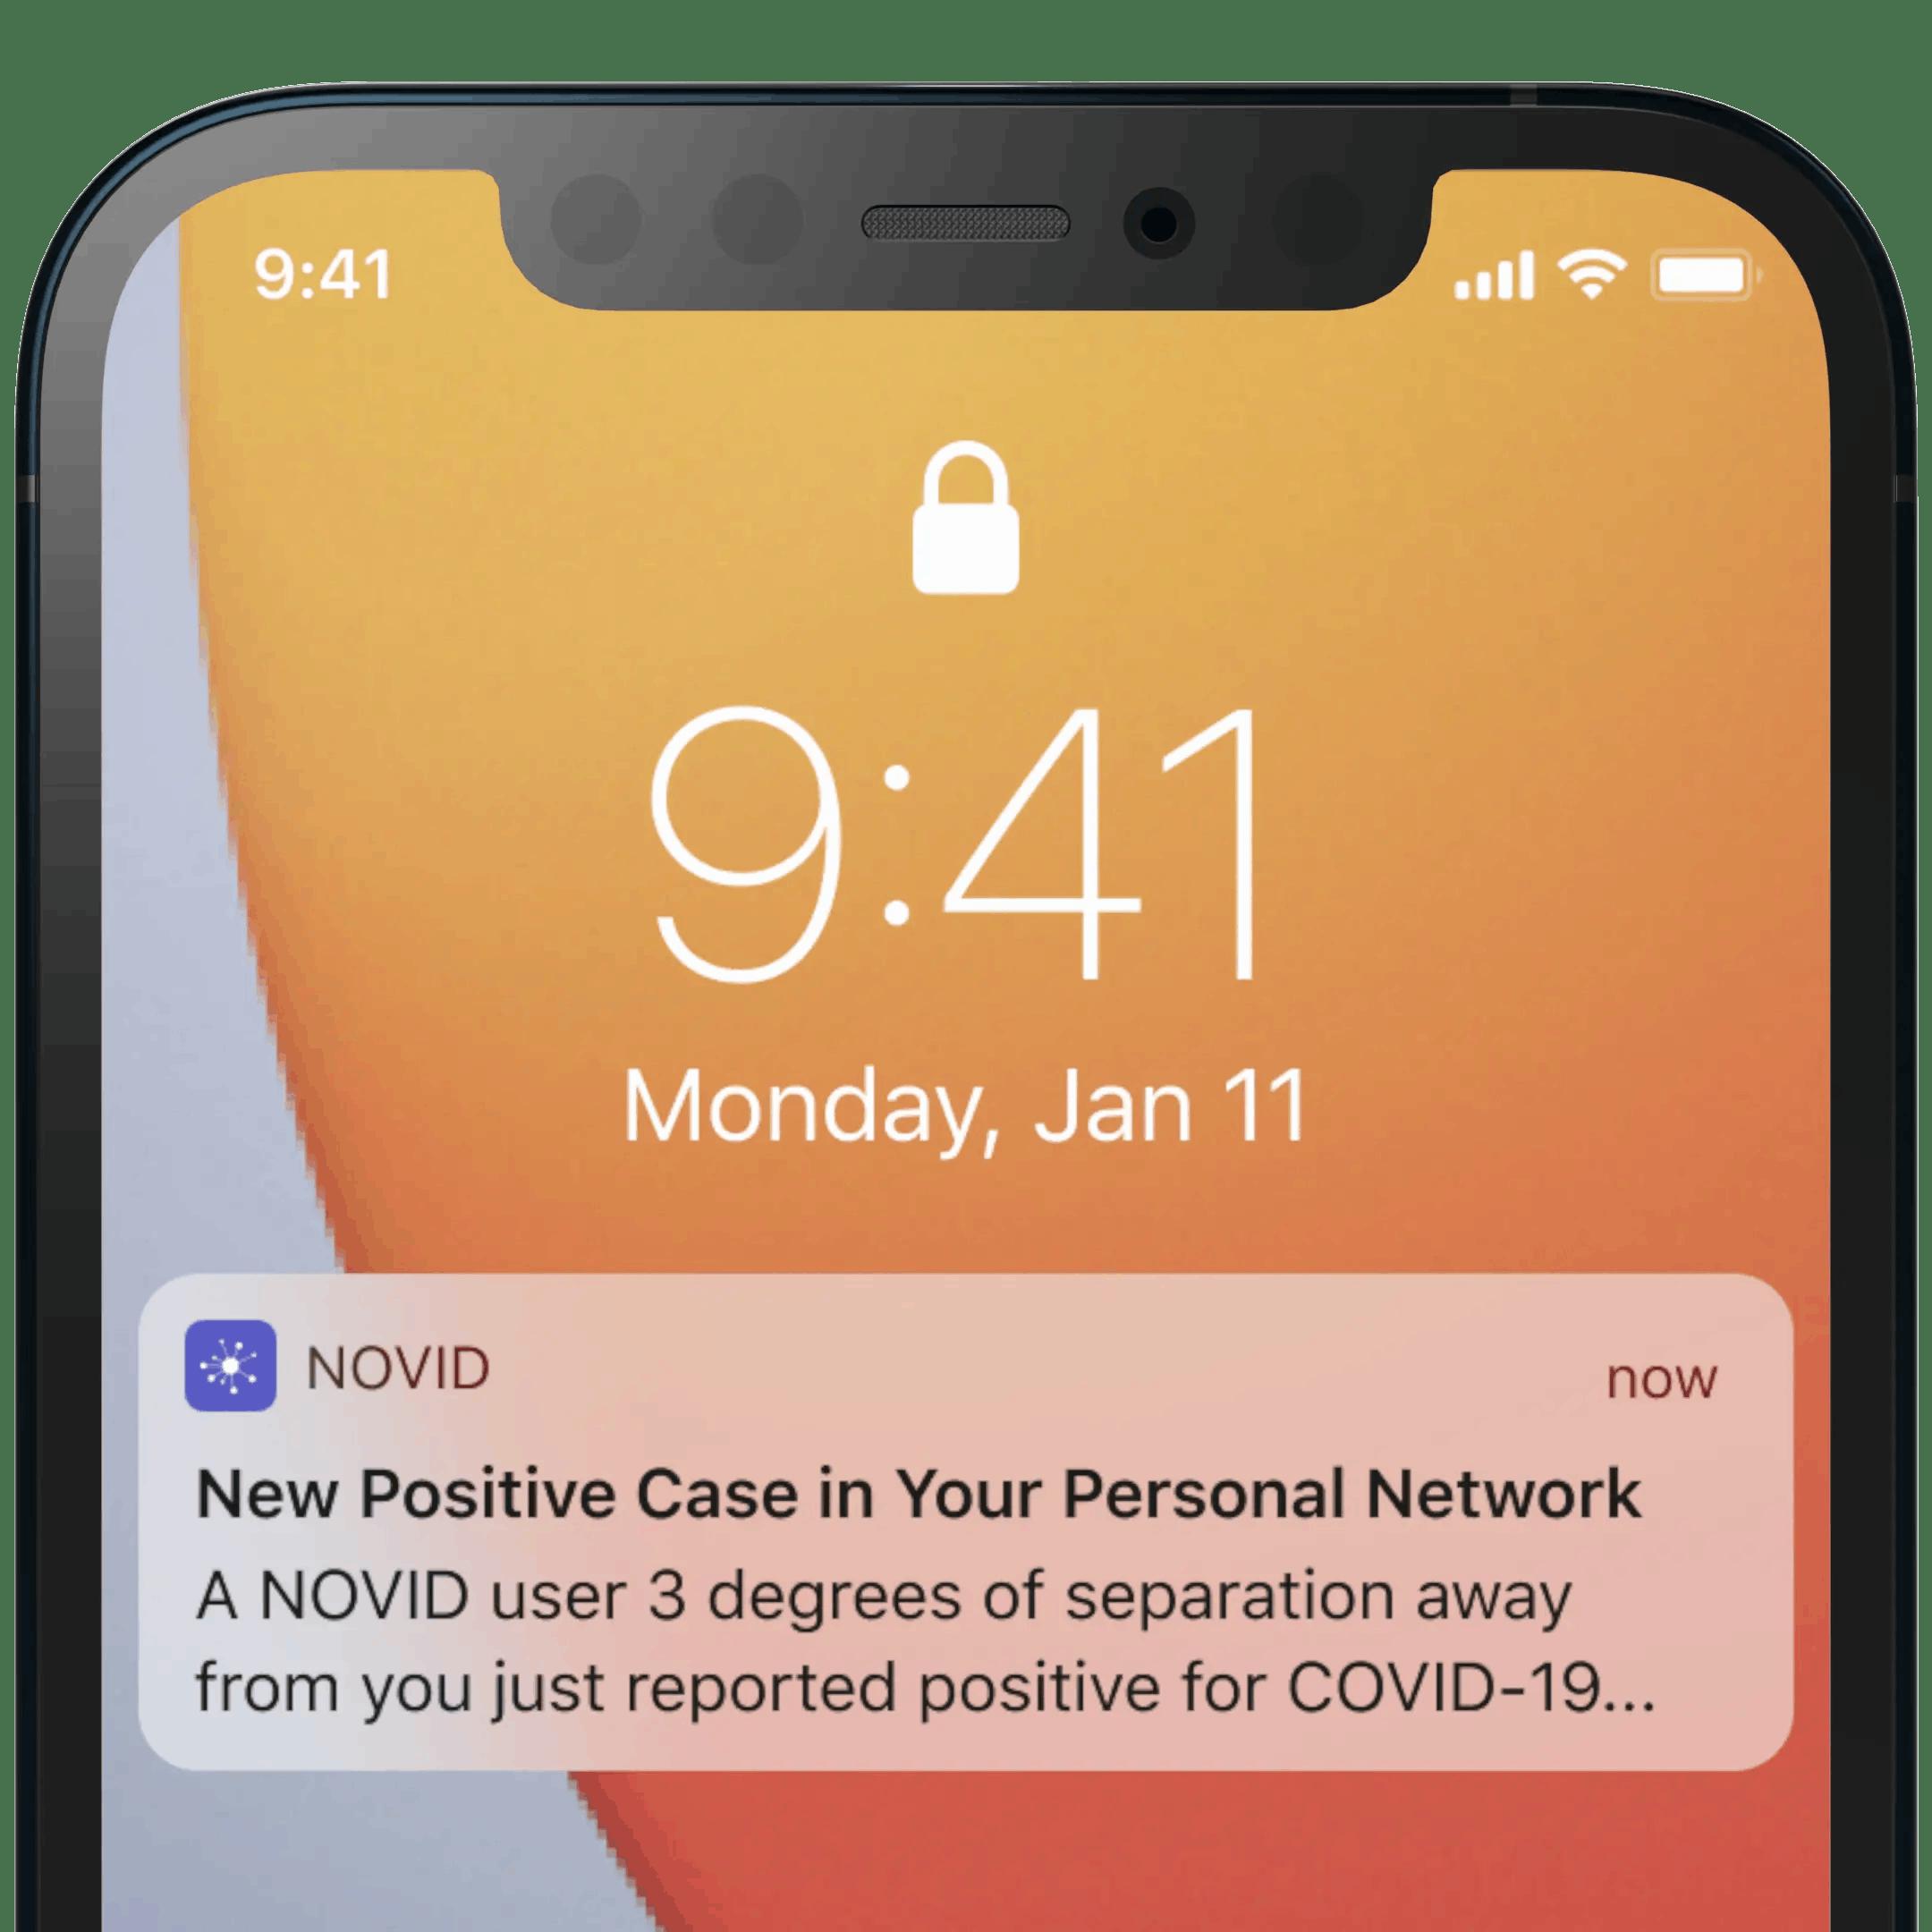 iPhone Pre-Exposure Notification